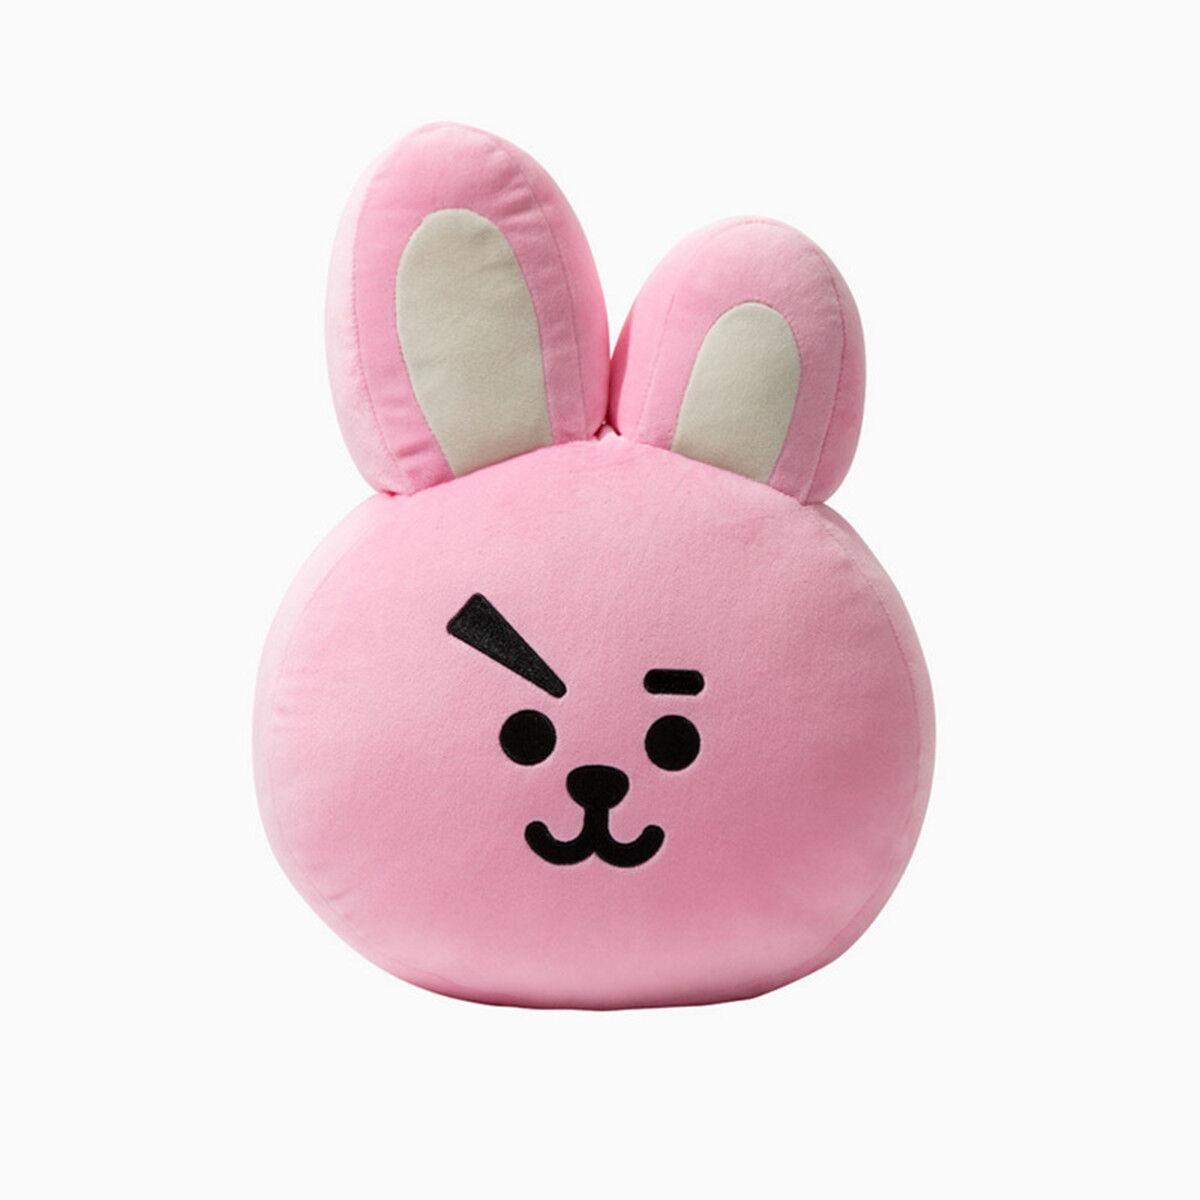 For KPOP BTS BT21 TATA SHOOKY RJ SUGA COOKY JIMIN Bed Plush Pillow Doll Cushion